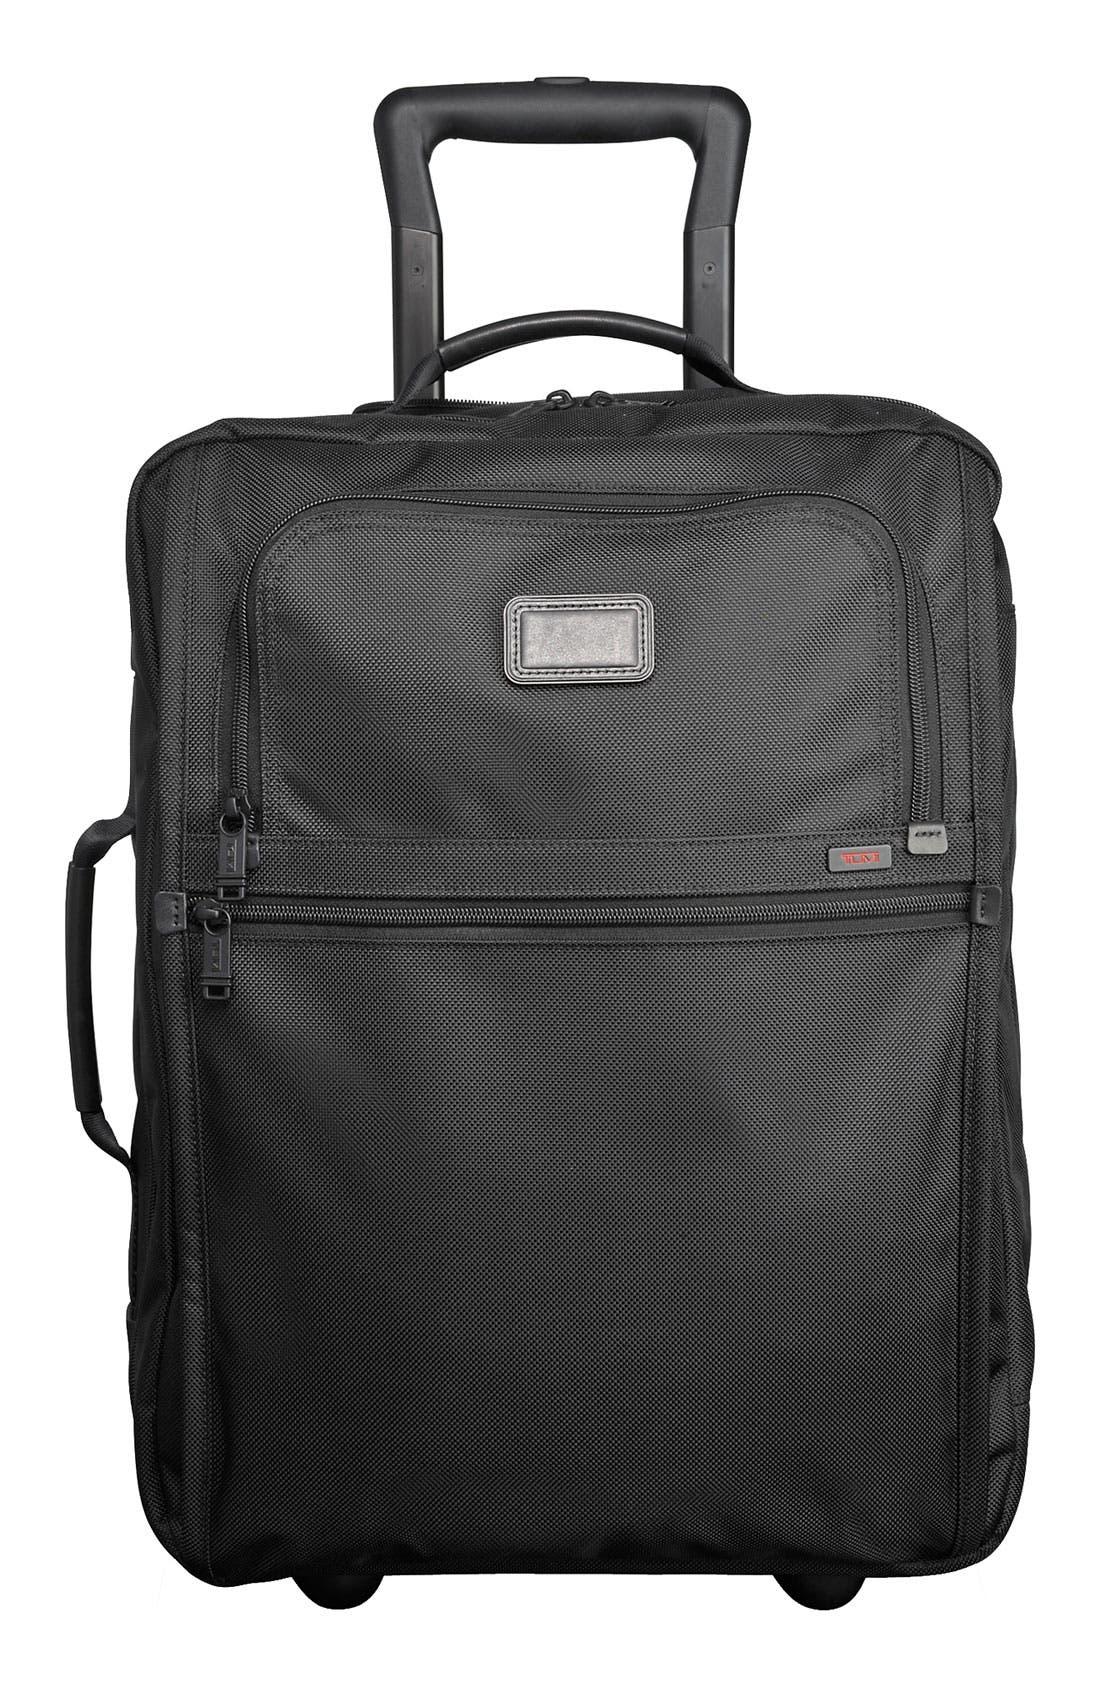 Main Image - Tumi 'Alpha - Super Léger' International Carry-On